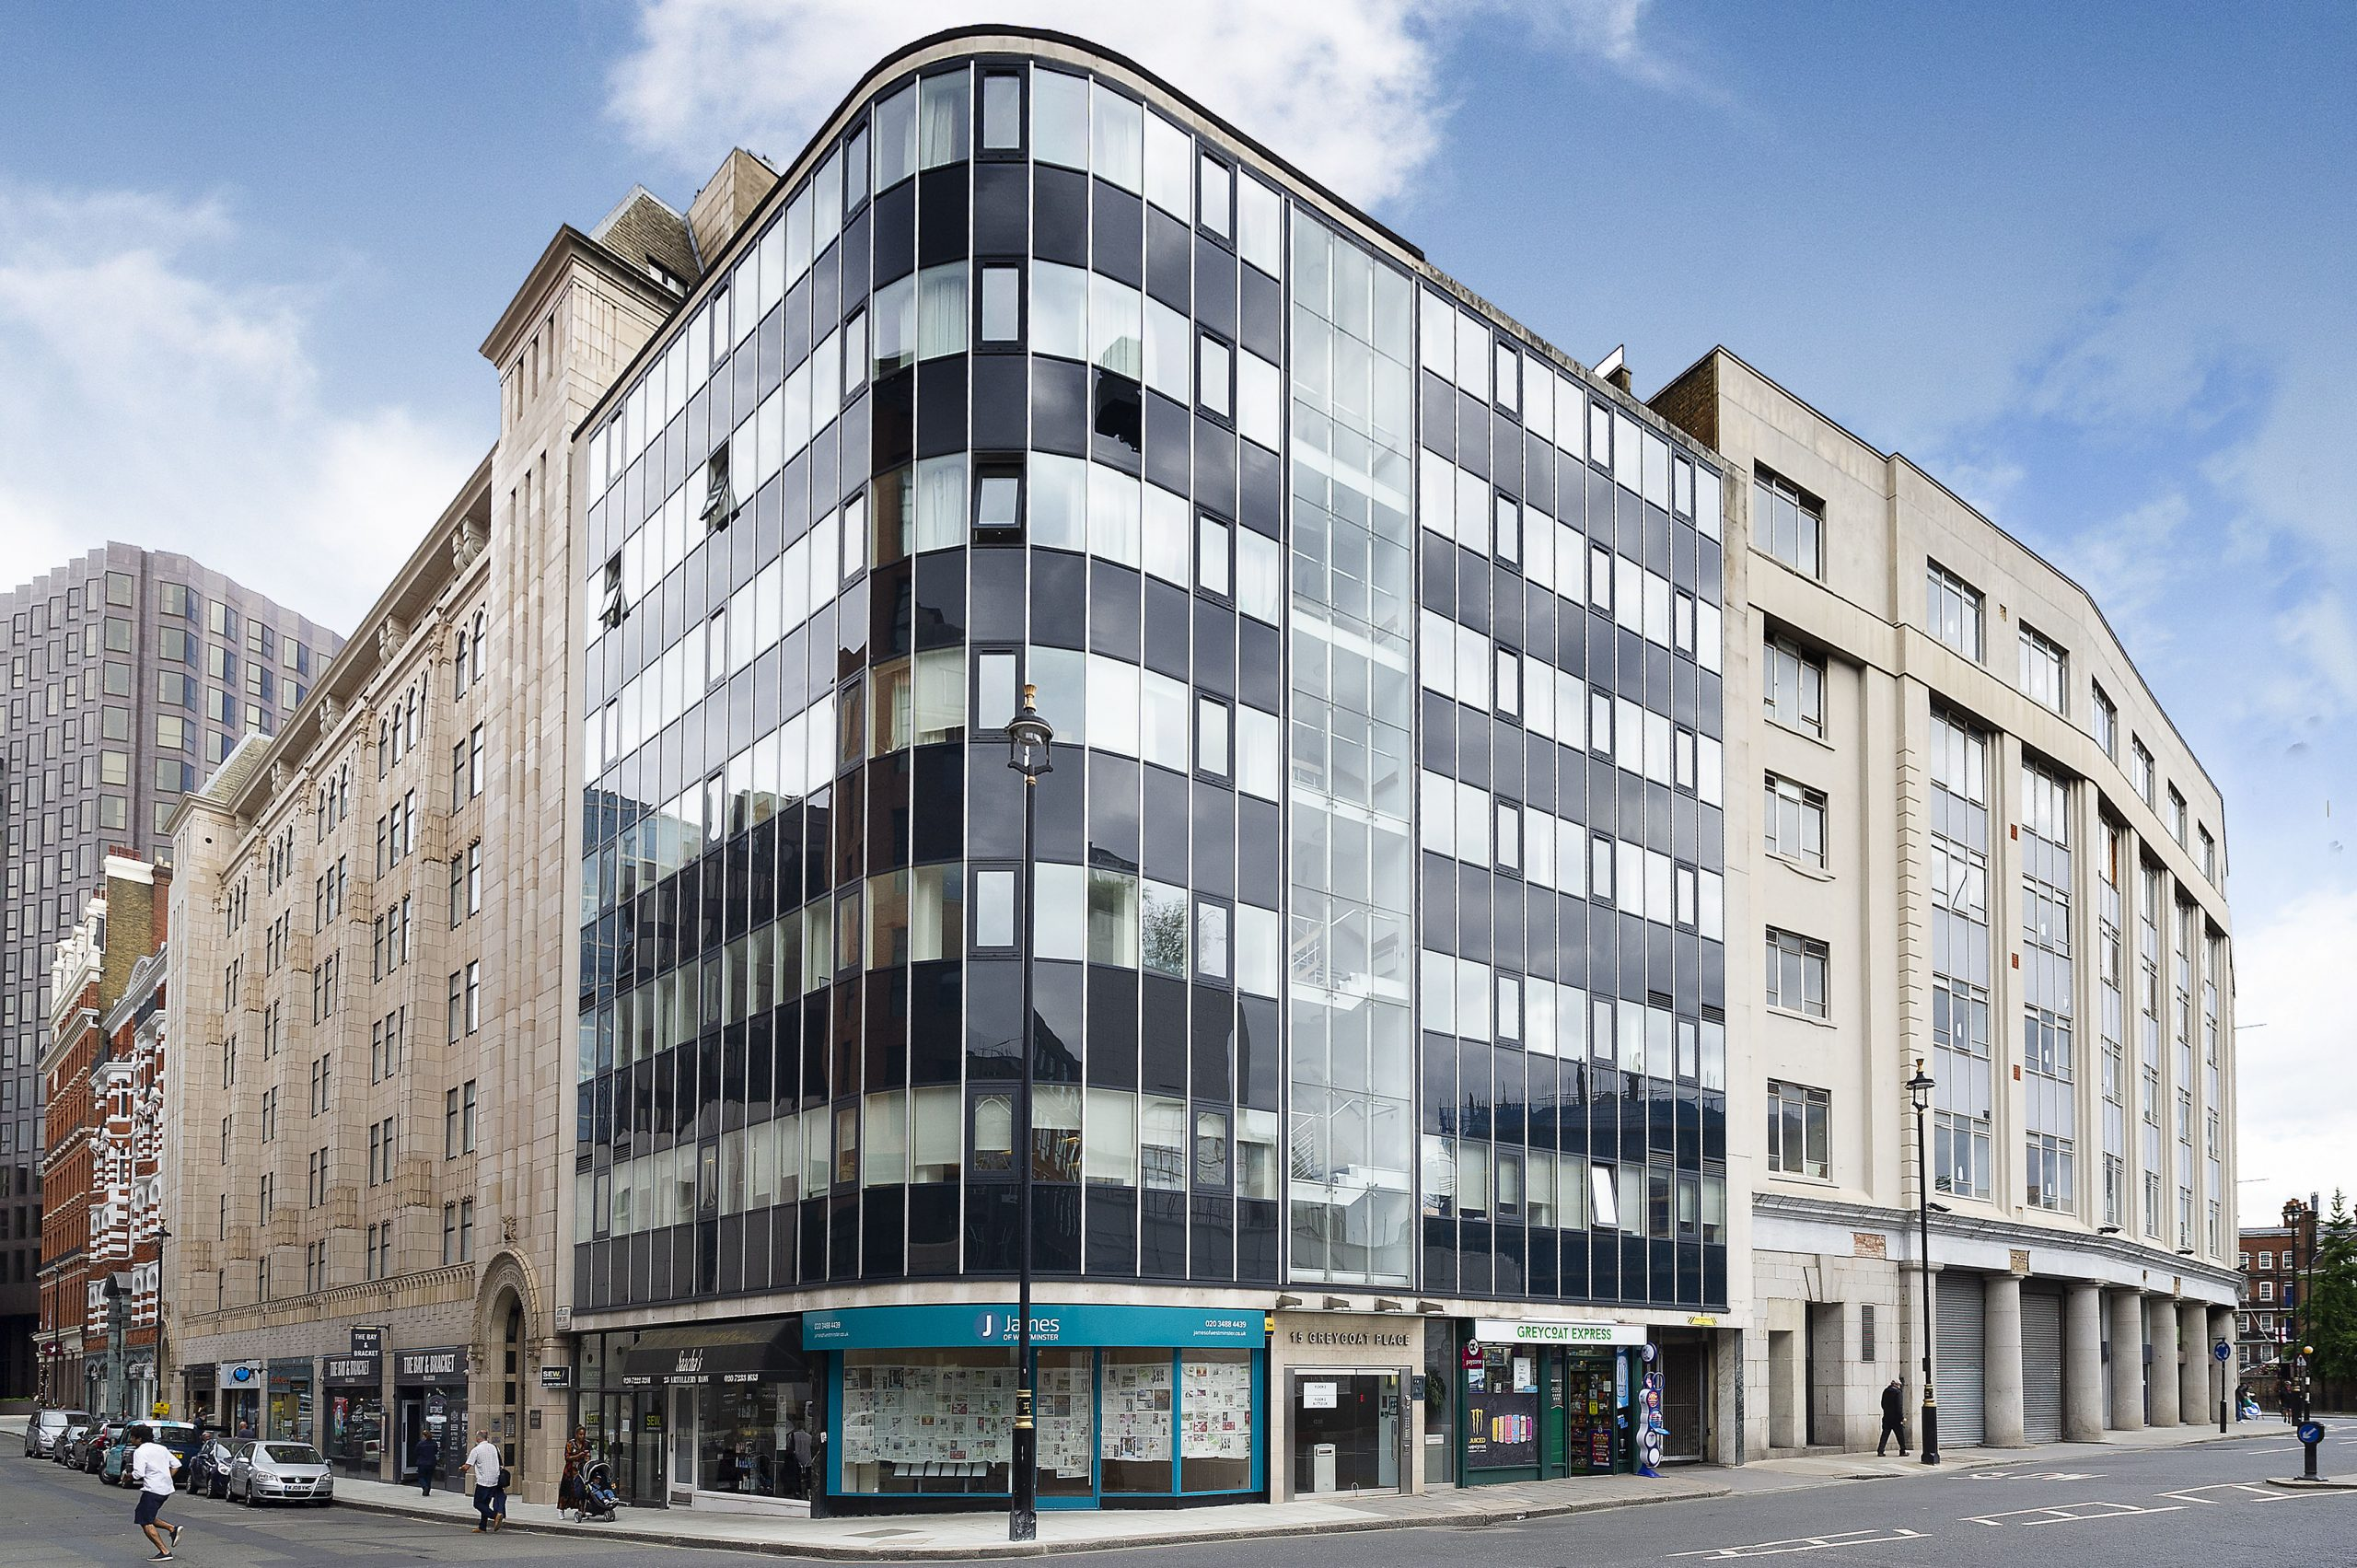 15 Greycoat Place, London, SW1P 1SB